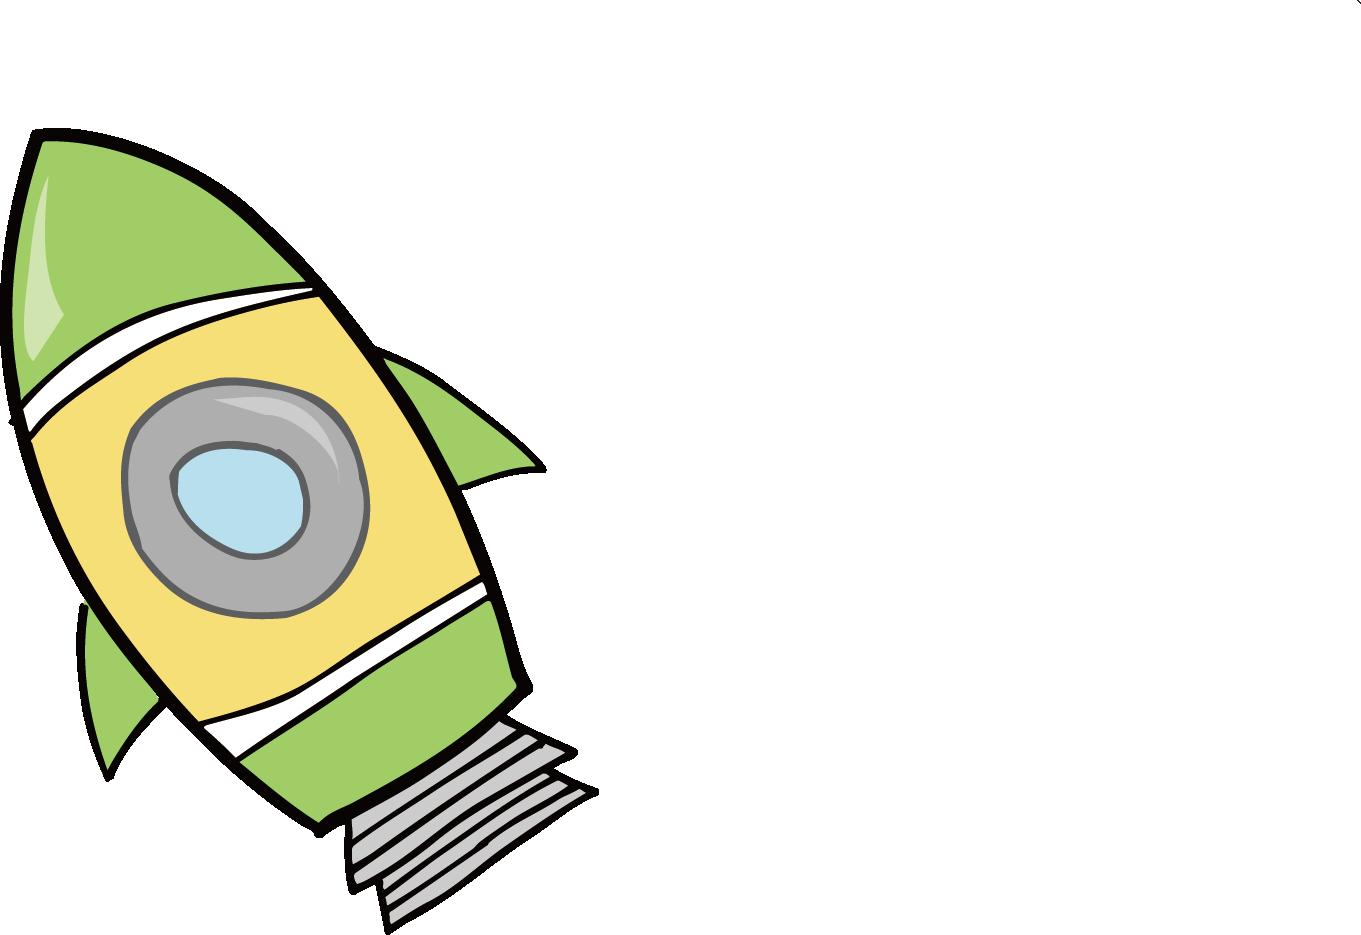 Clipart rocket drawing. Cartoon at getdrawings com